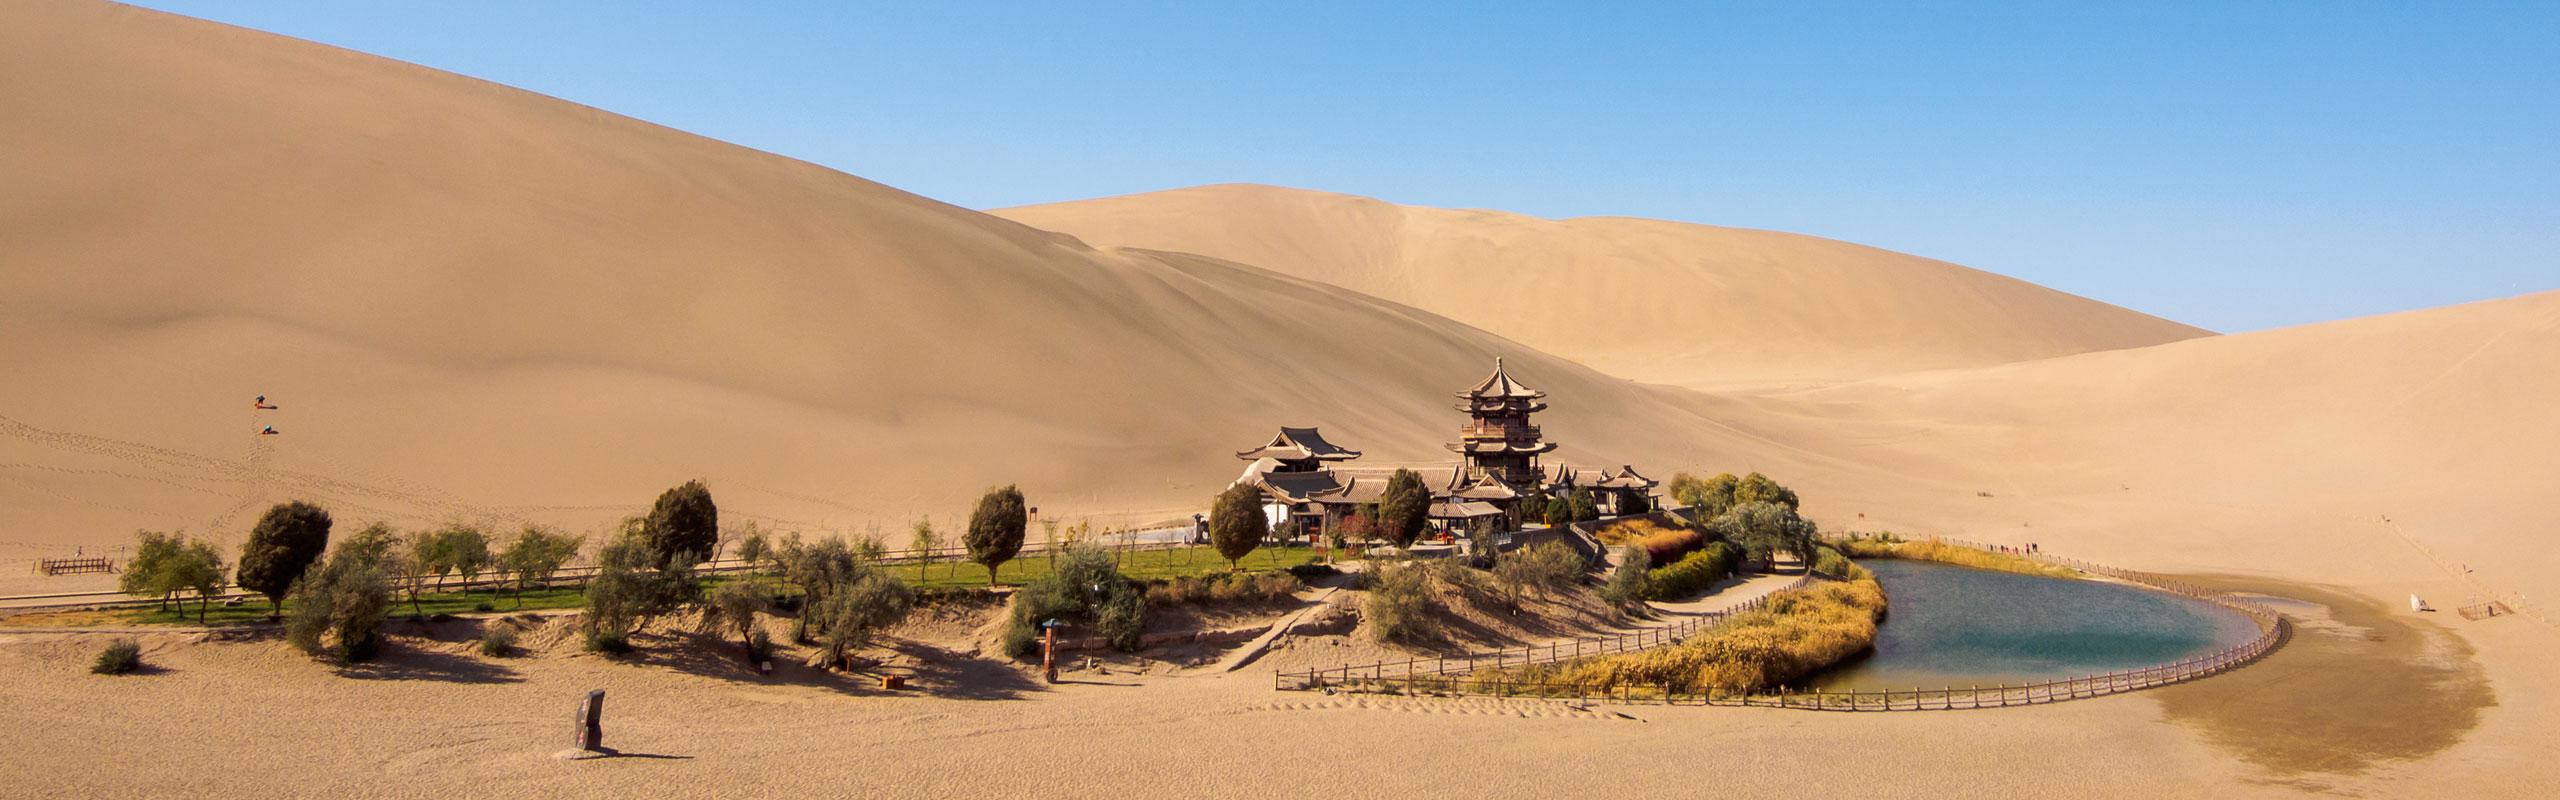 10-Day Urumqi to Xi'an Silk Road Adventure by Shangri-la Express